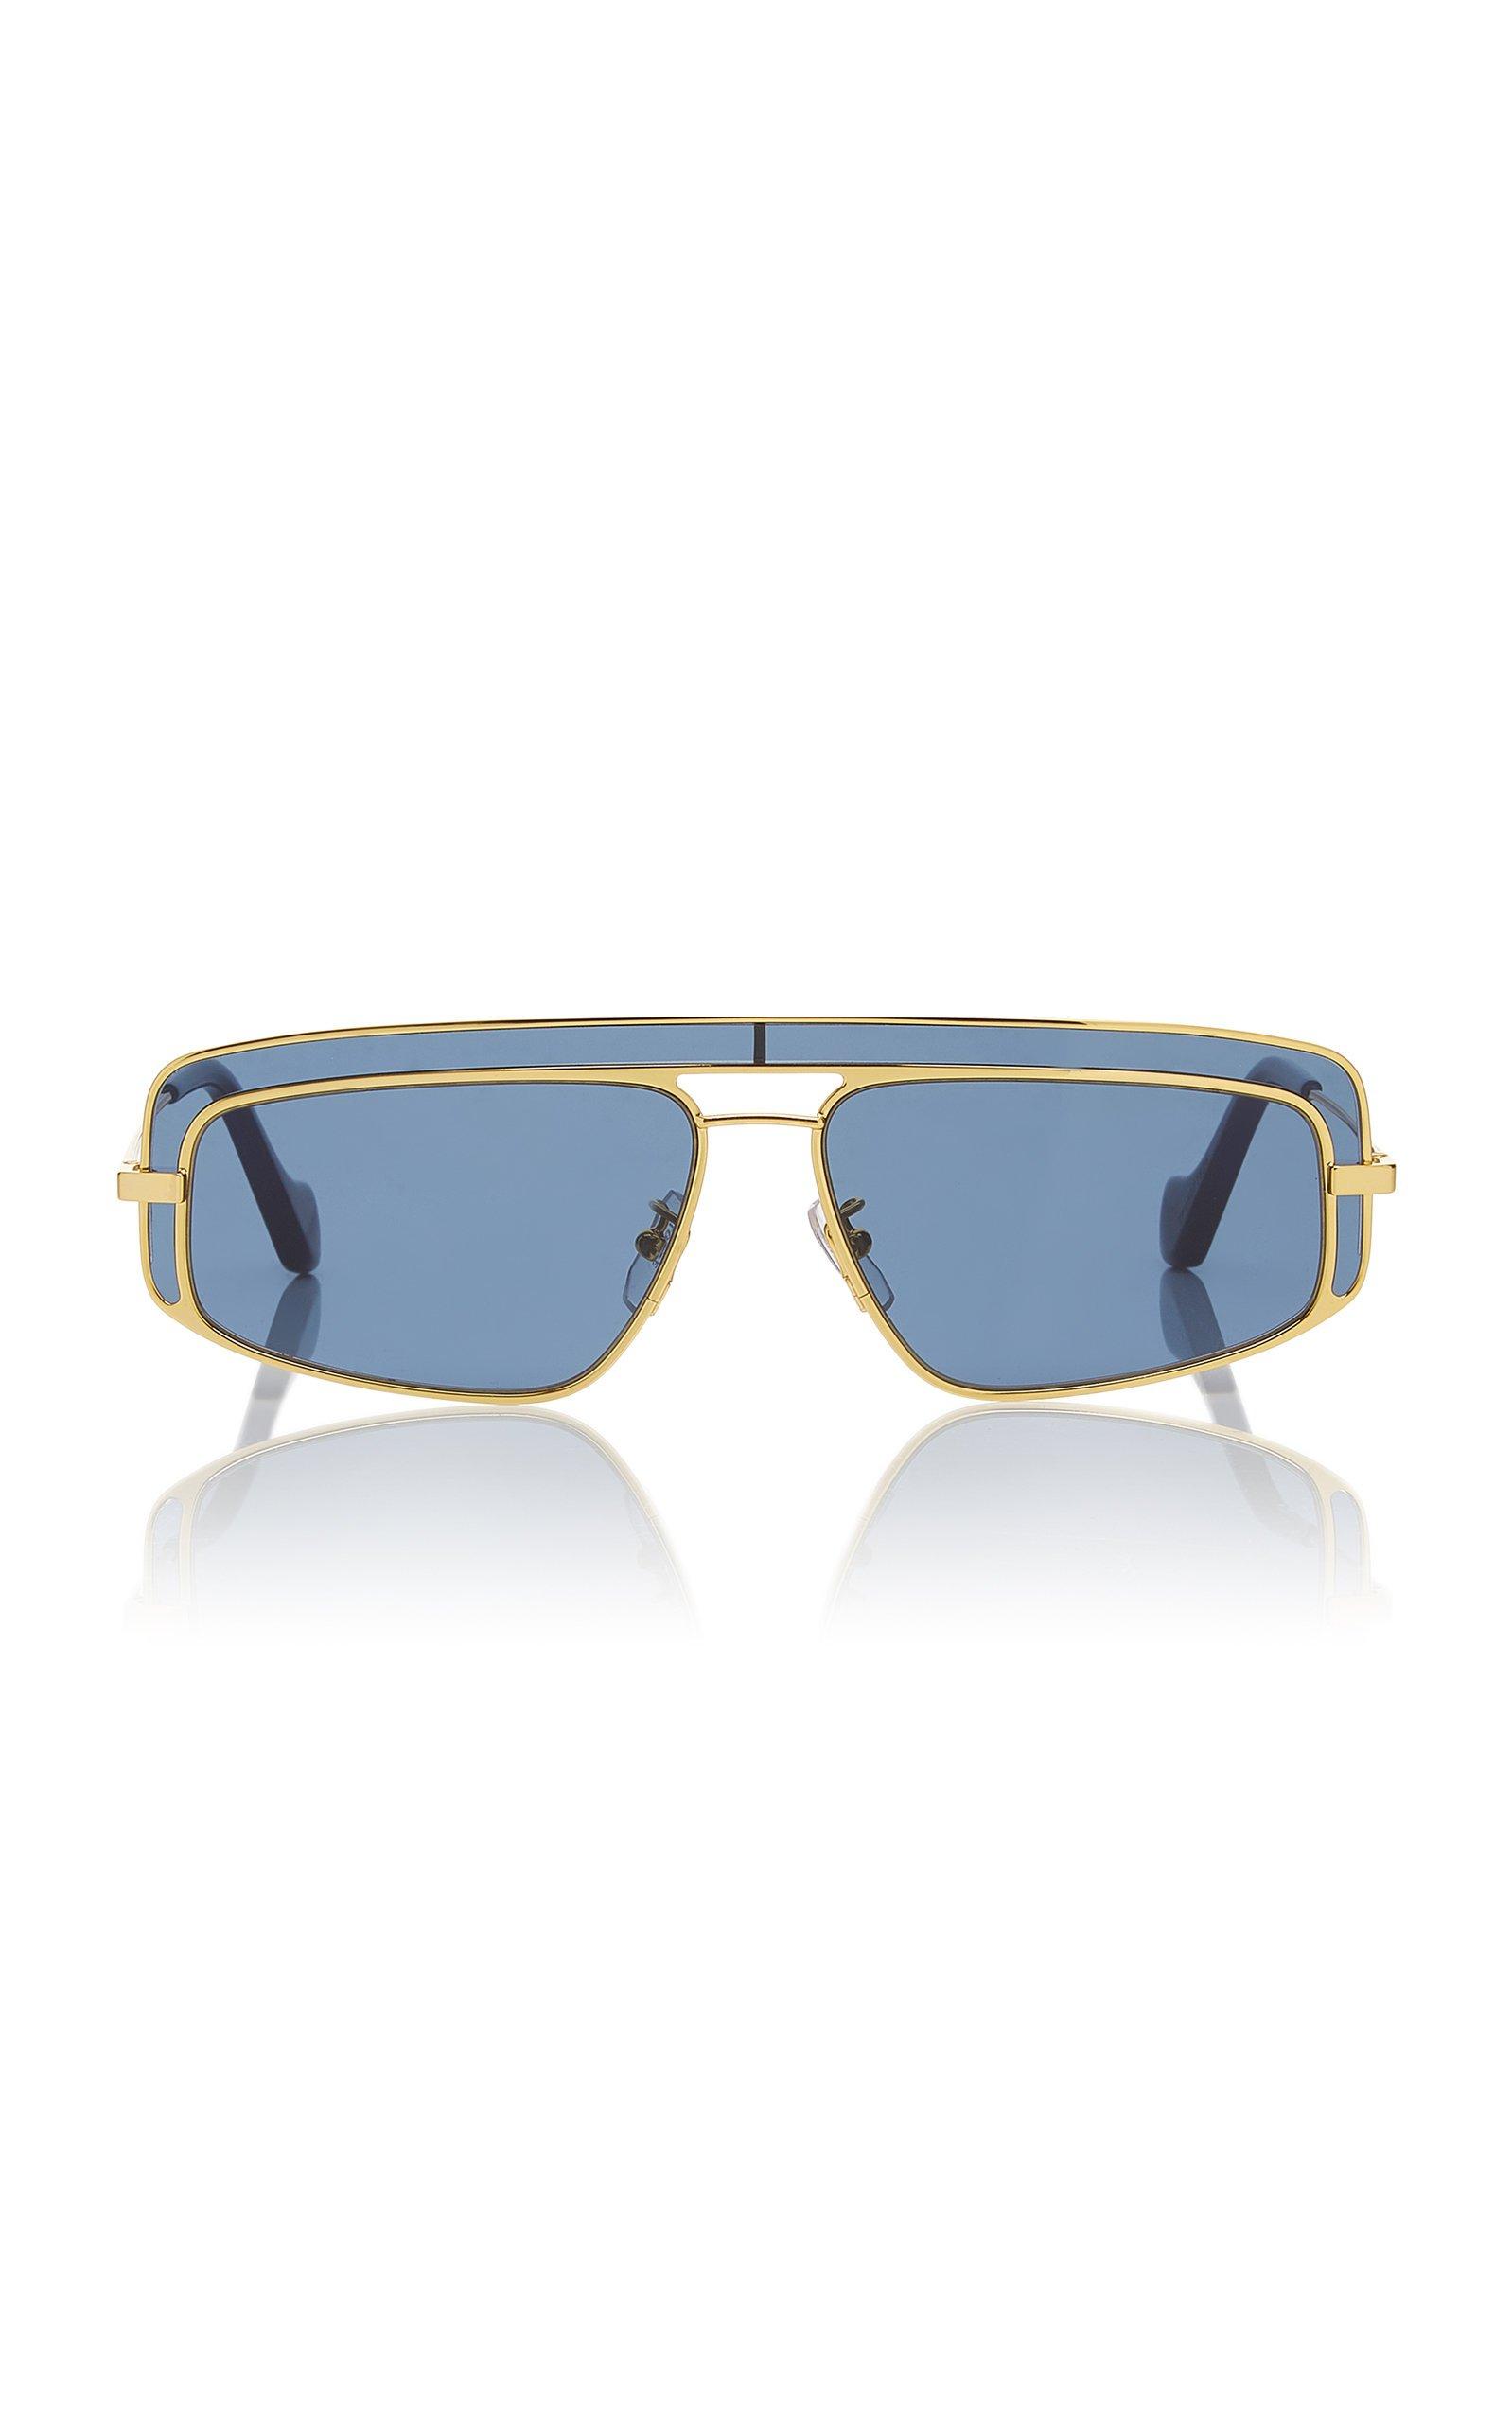 Loewe Sunglasses Square-Frame Metal Sunglasses